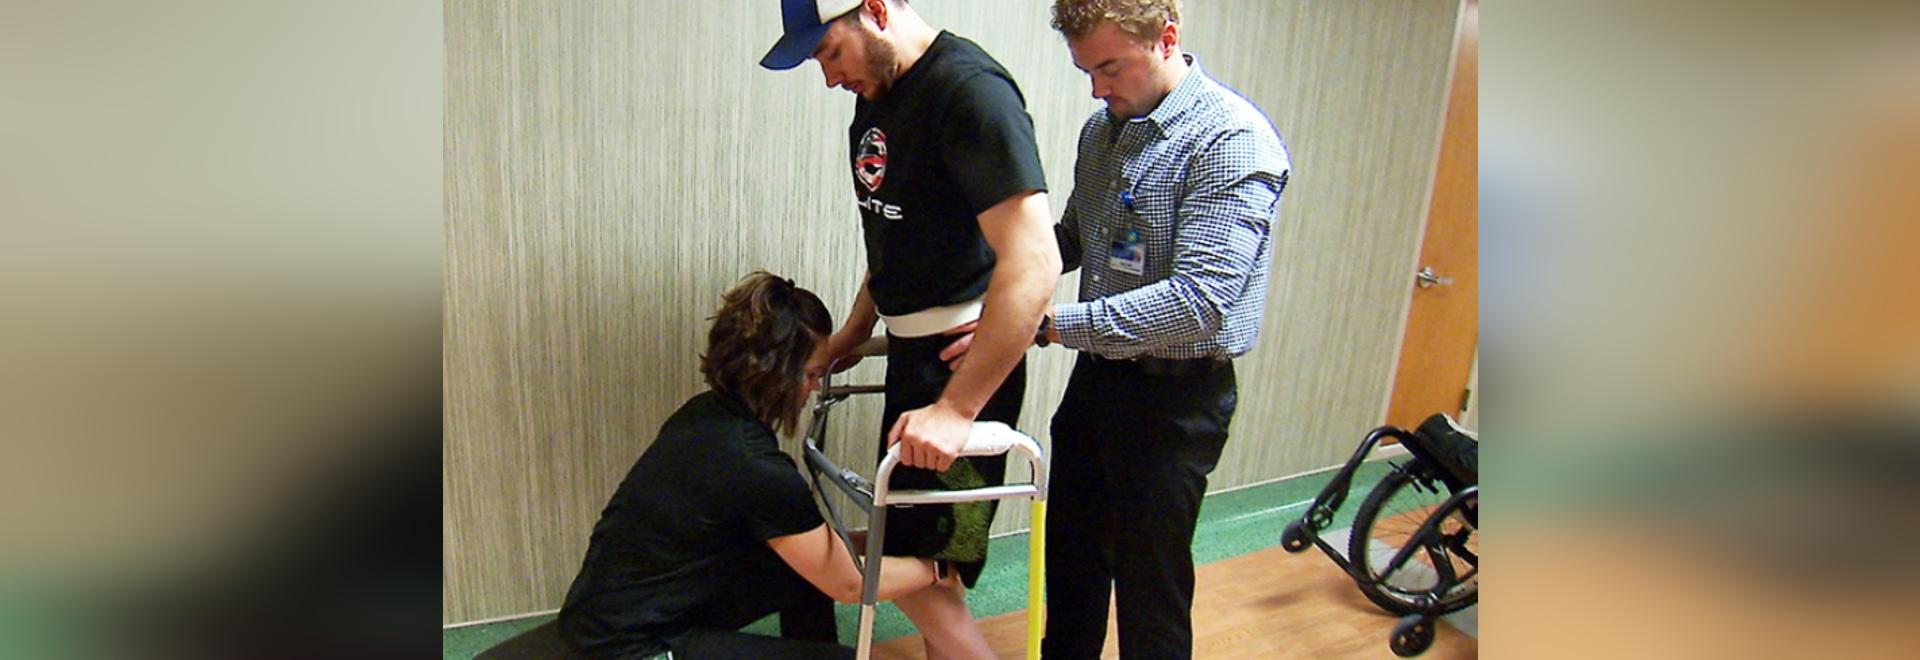 Paraplegic Man Walks Again Thanks to Implanted Spinal Cord Stimulator